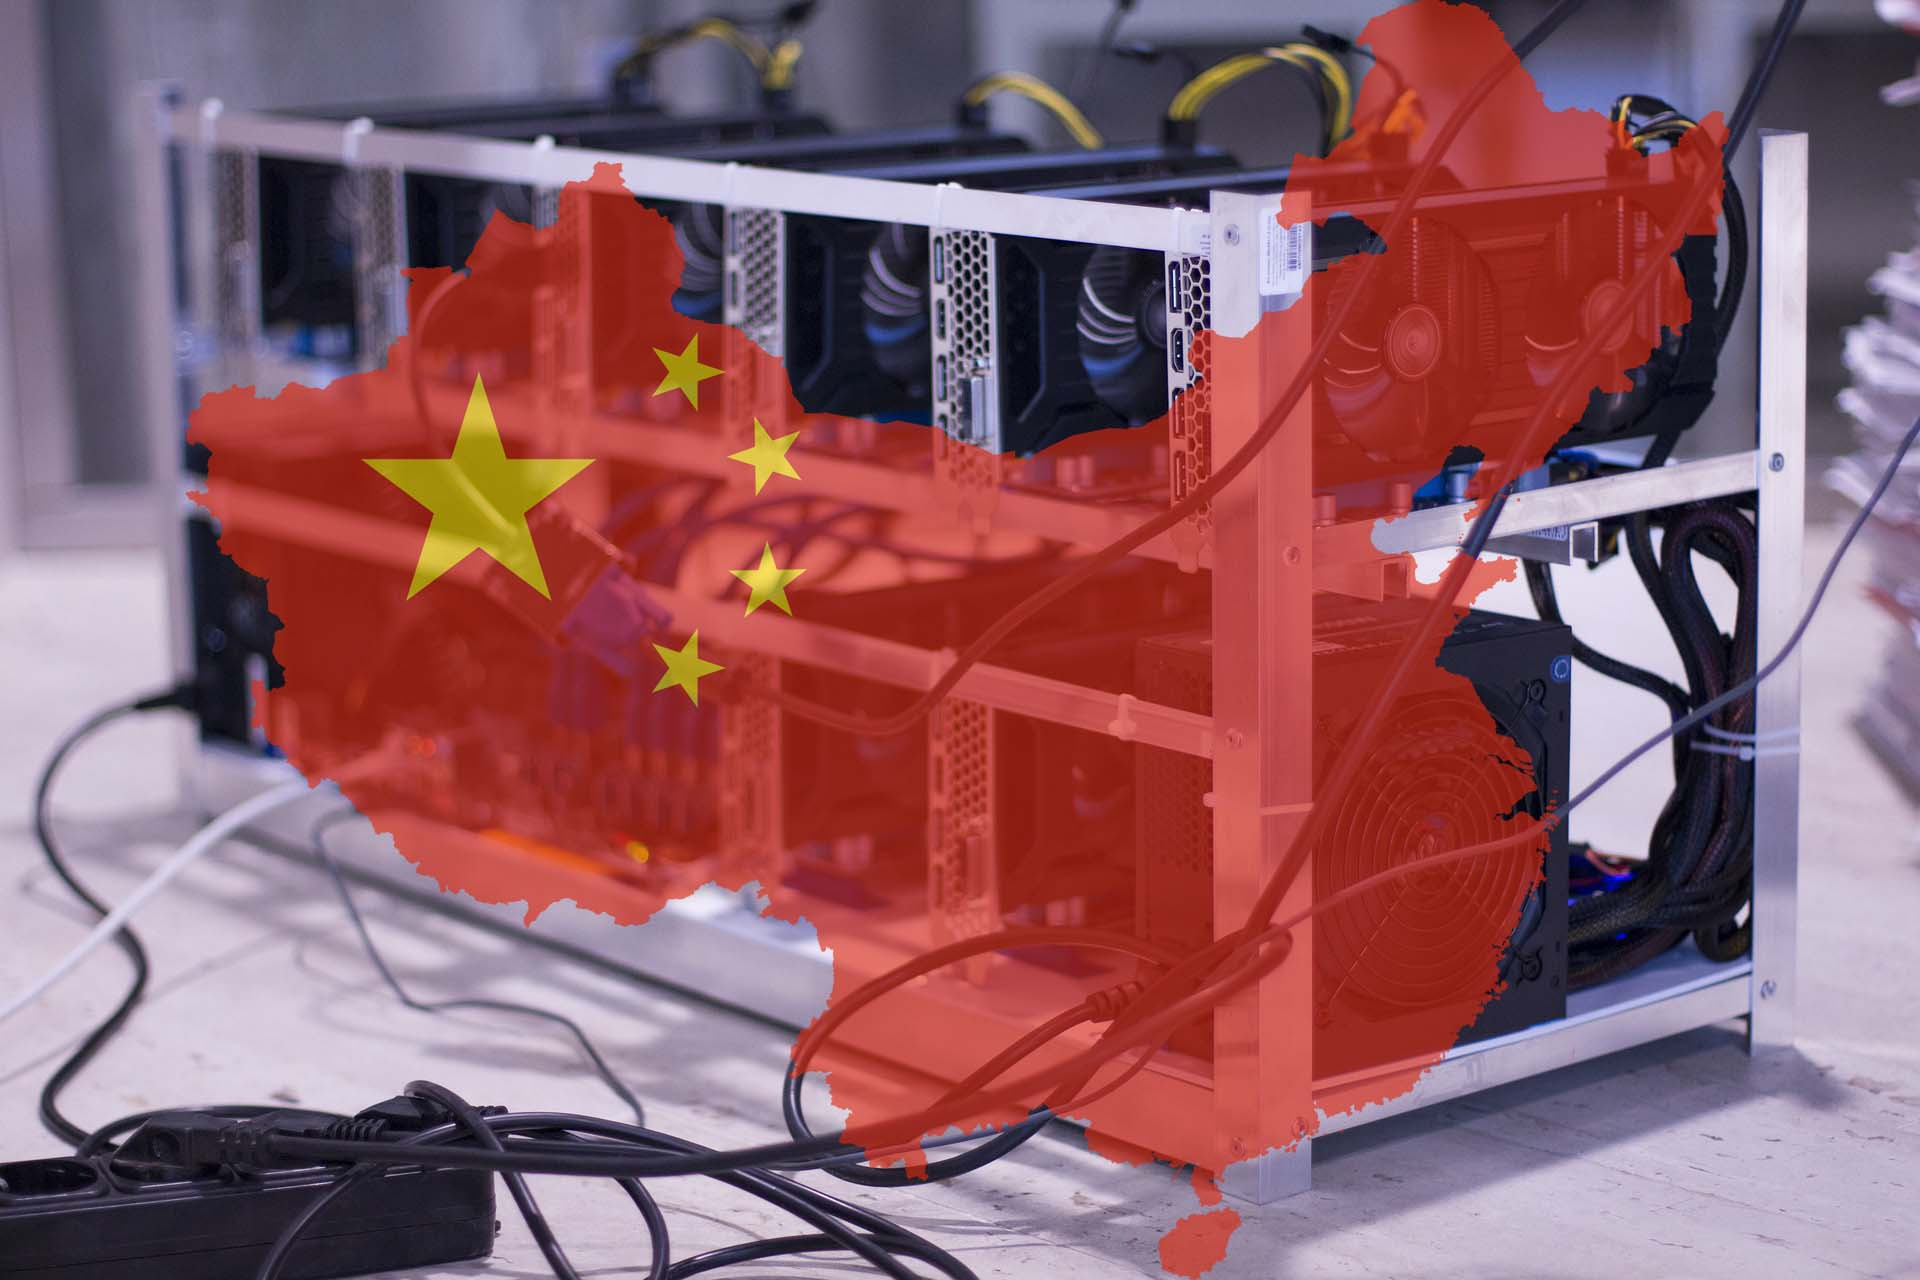 Bitcoin crash: China crackdown